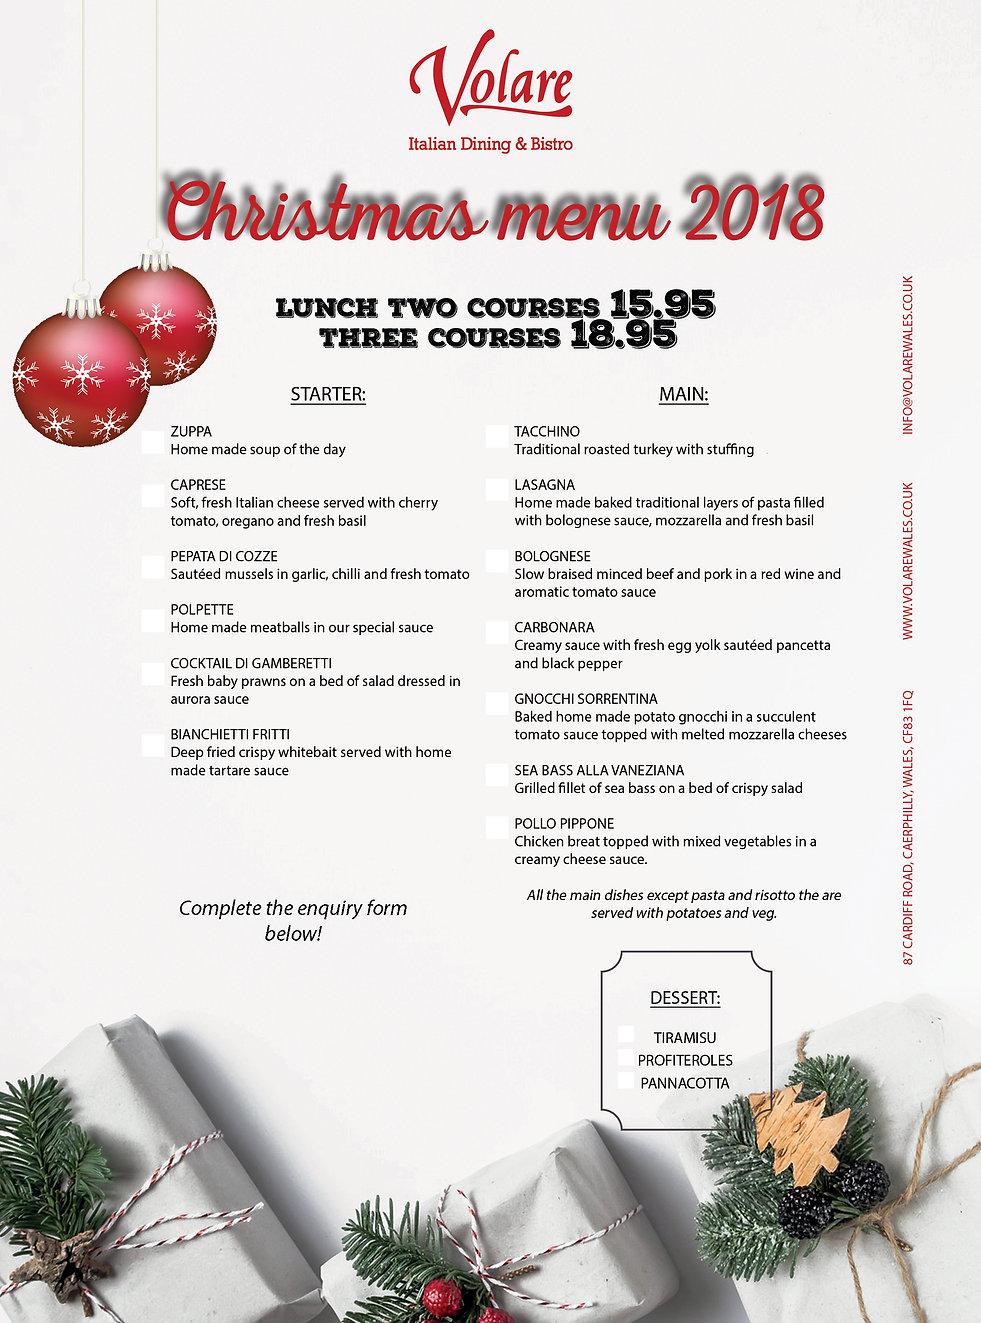 Volare Lunch menu flyer website.jpg